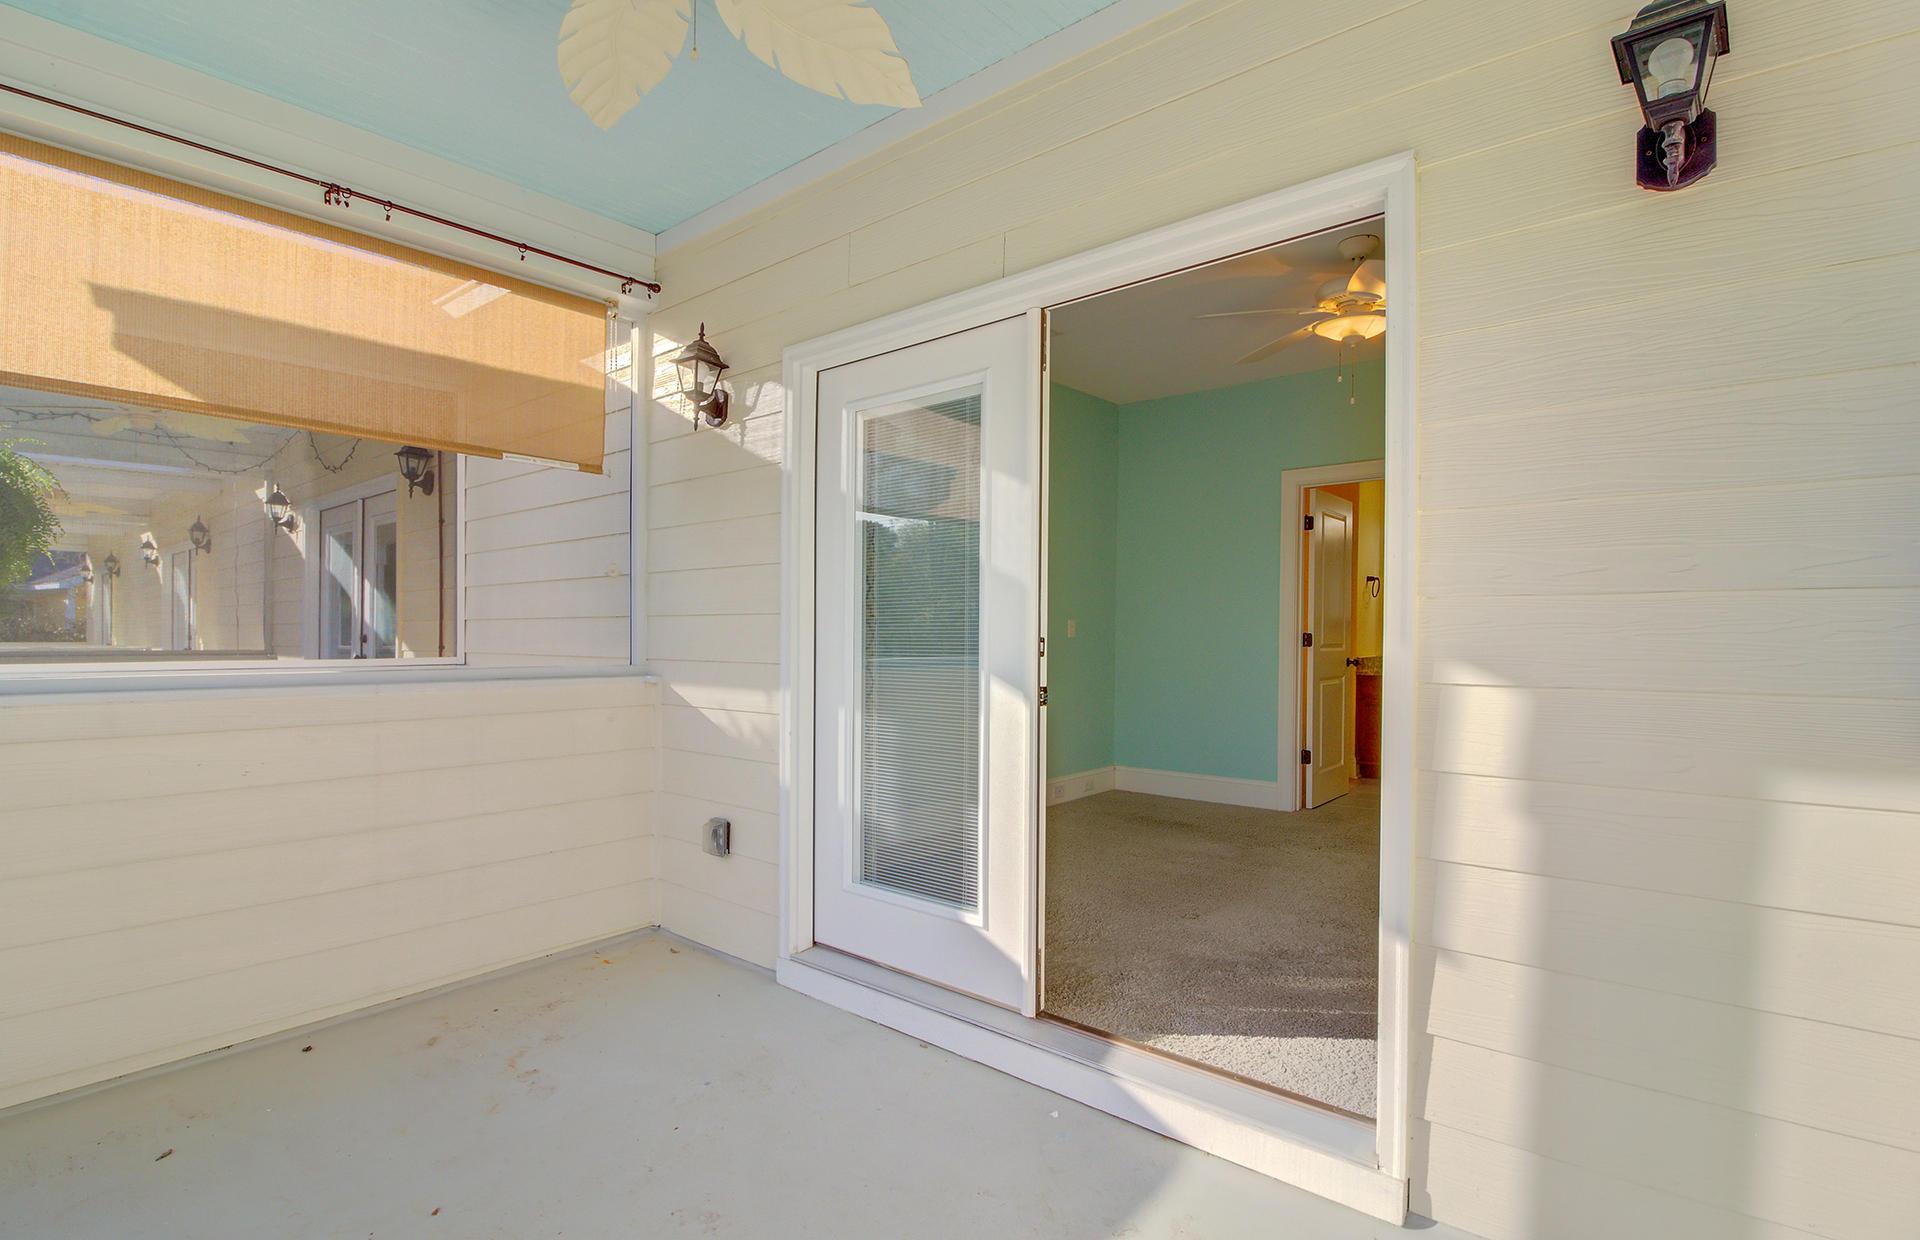 Carol Oaks Town Homes Homes For Sale - 2960 Emma, Mount Pleasant, SC - 22